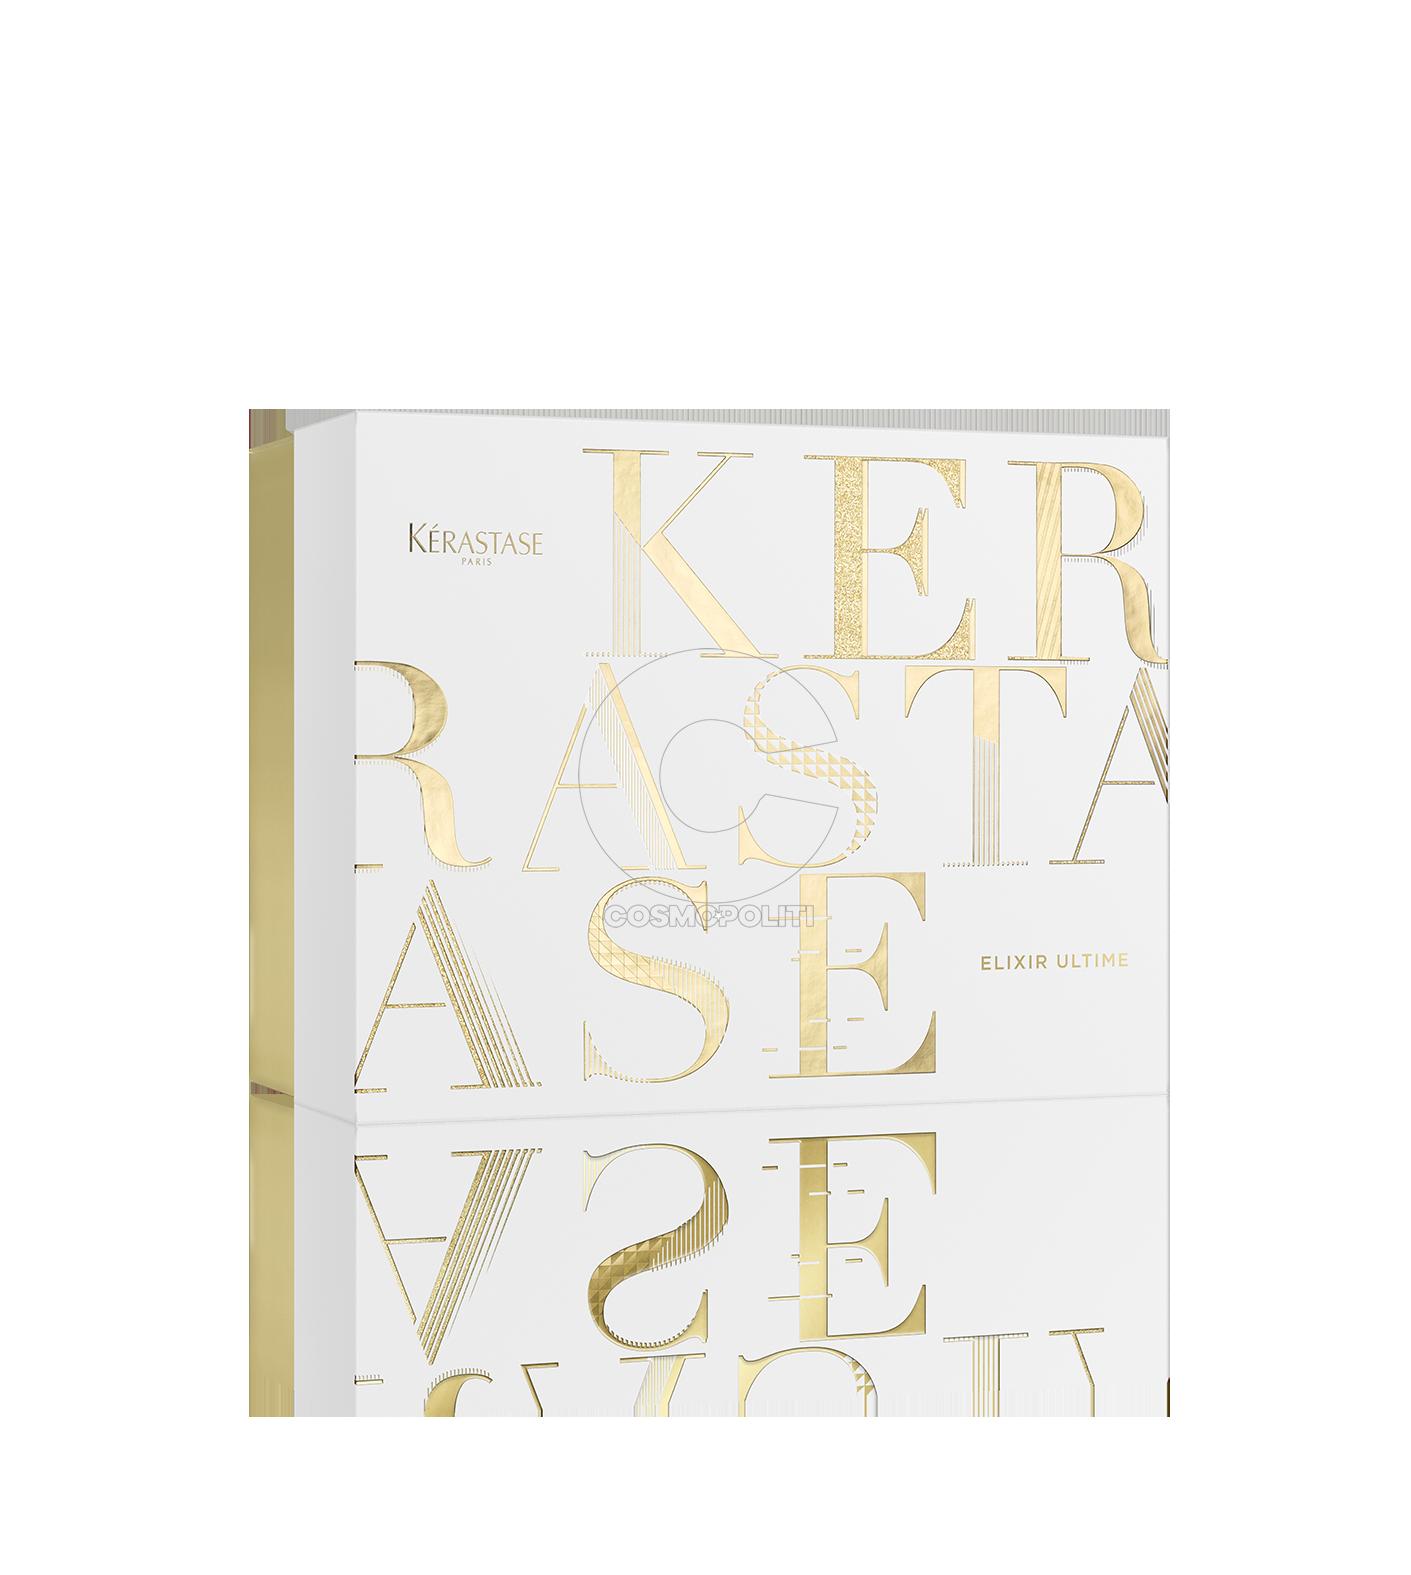 Kérastase 18 - NOEL - Elixir ultime Masque Coffret 3-4 (BD)